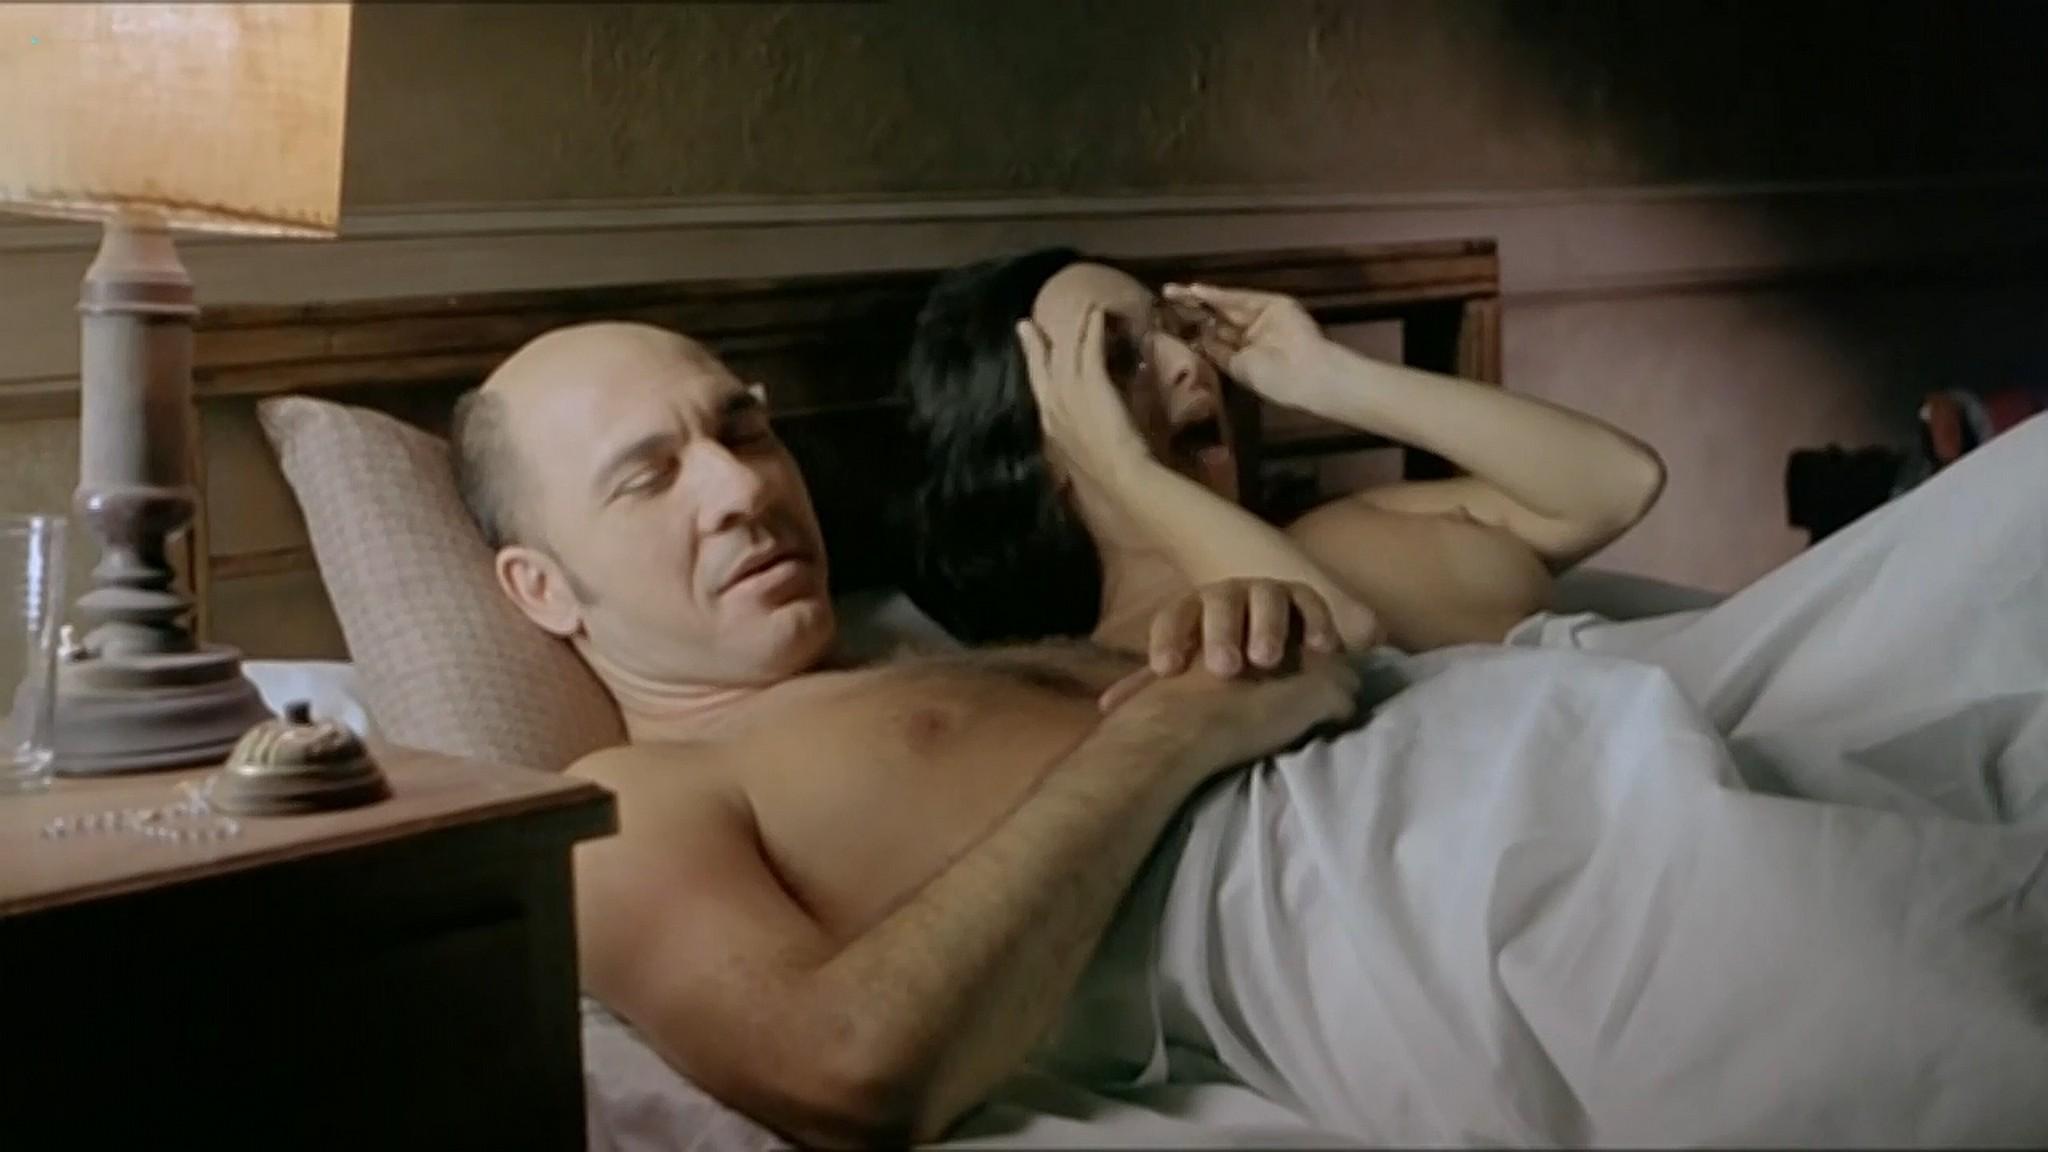 Ariadna Gil nude sex Sandra Ballesteros and other nude and sex El lado oscuro del corazon 2 AR 2001 720p 2